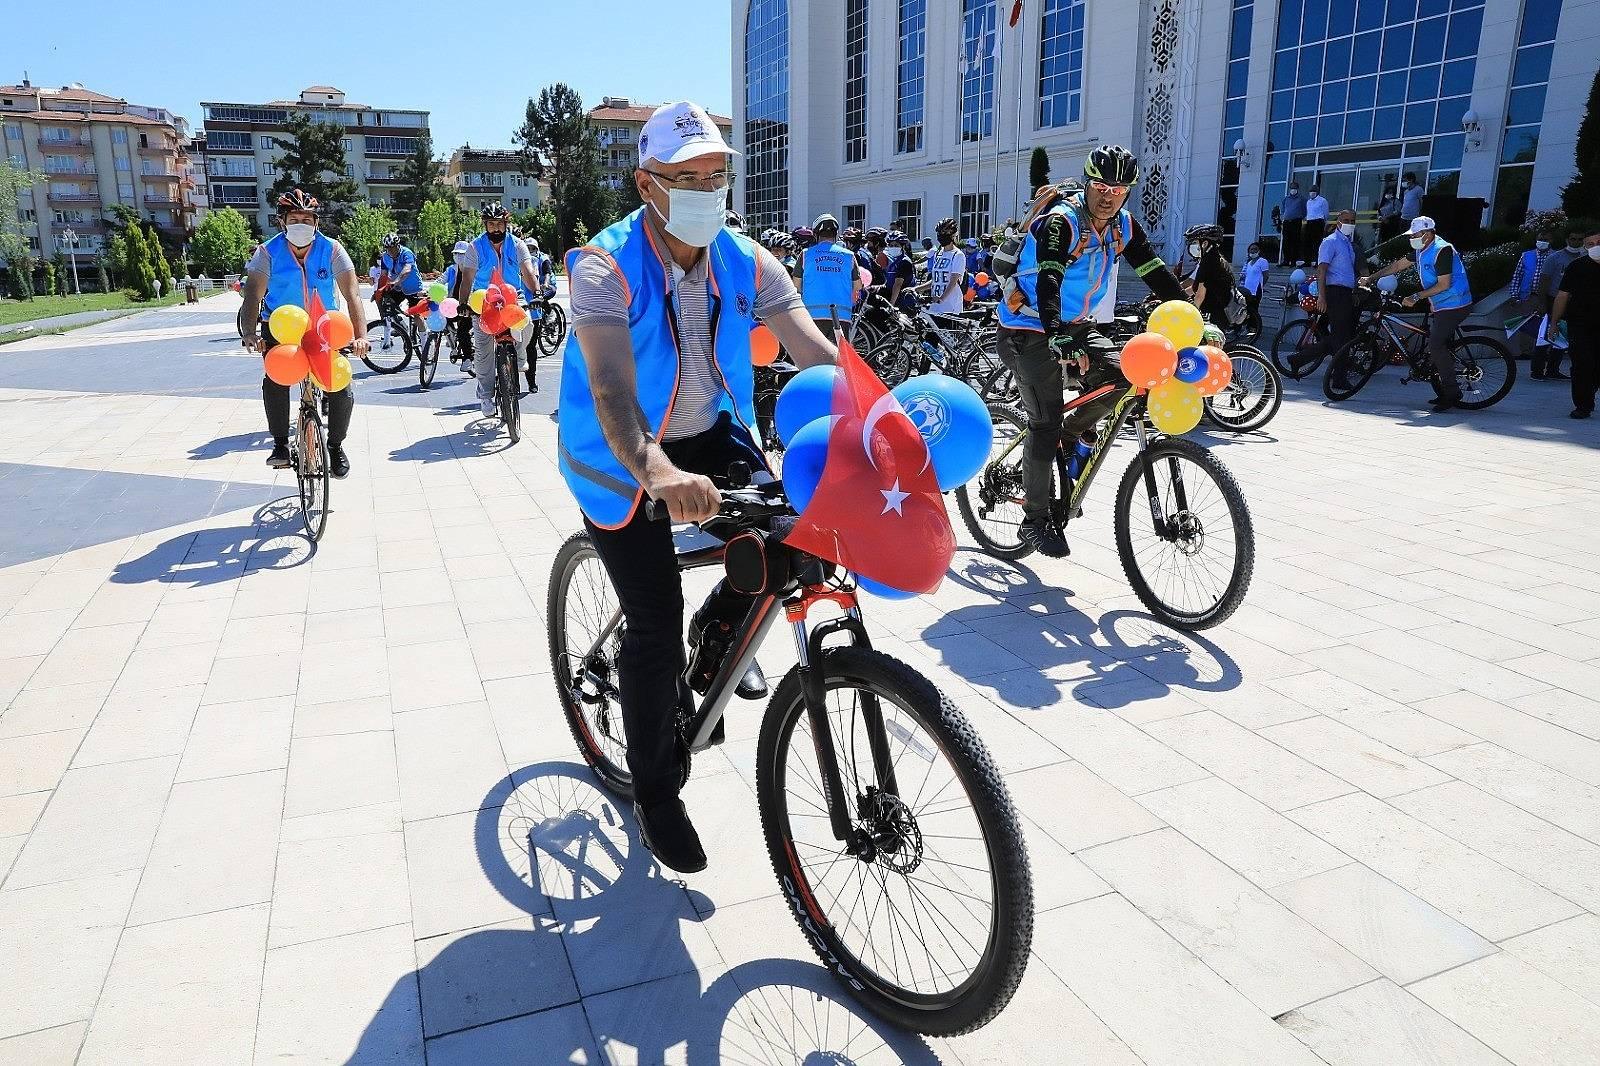 2021/06/battalgazi-belediyesinden-ozel-bisiklet-turu-etkinligi-20210606AW33-3.jpg